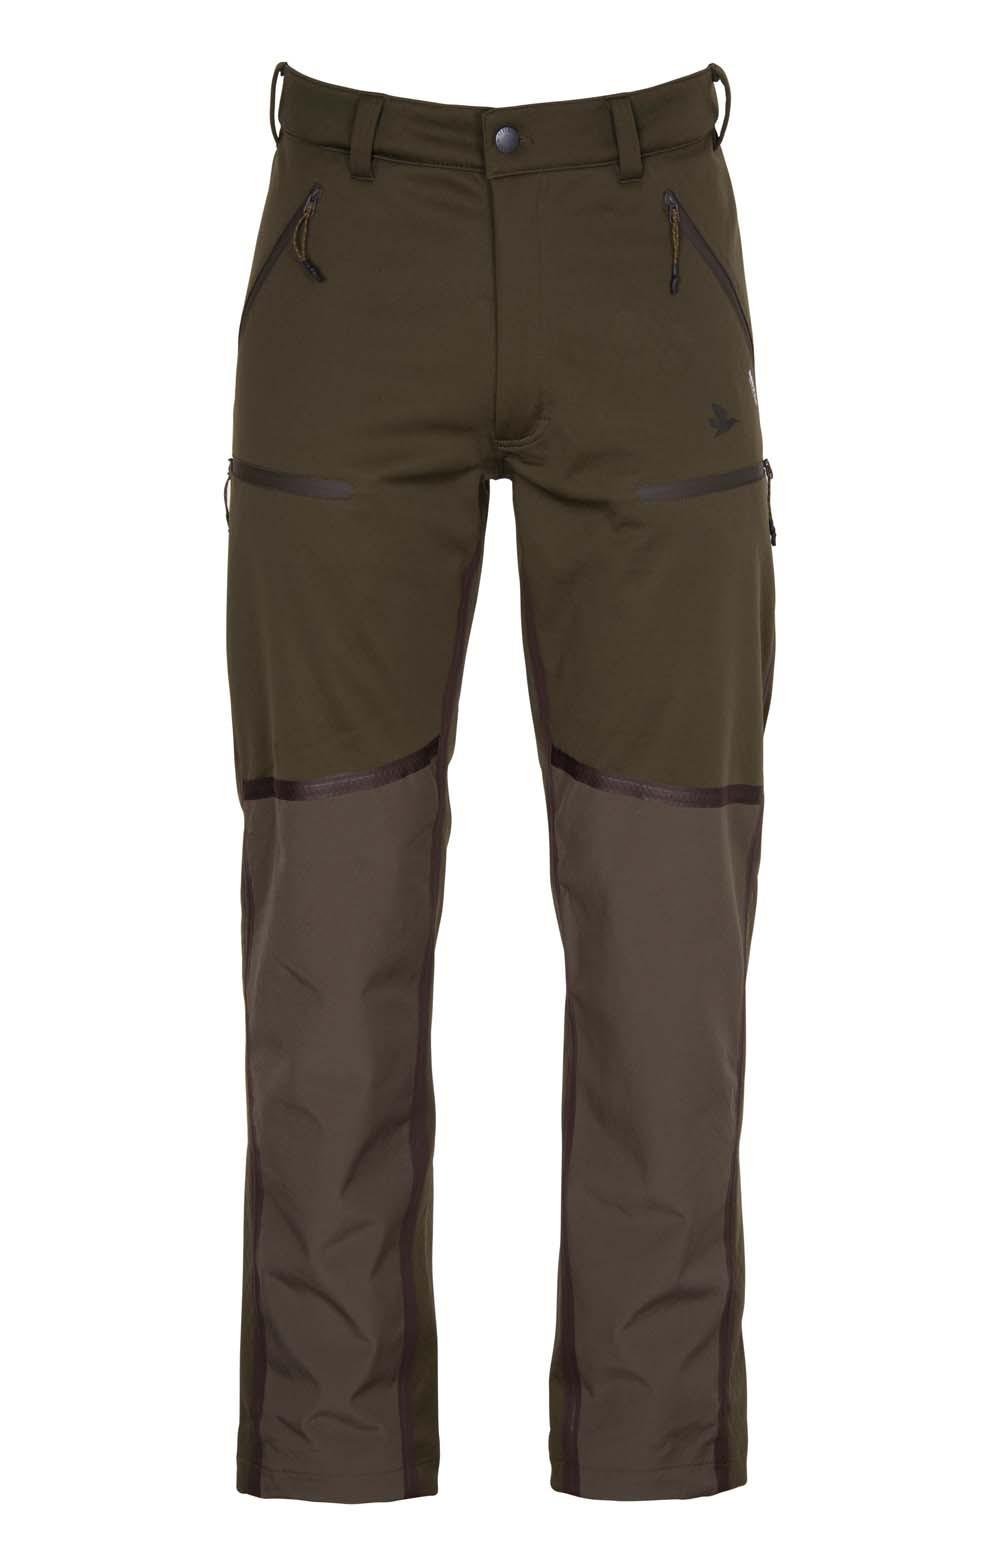 Seeland Hawker Advance trousers